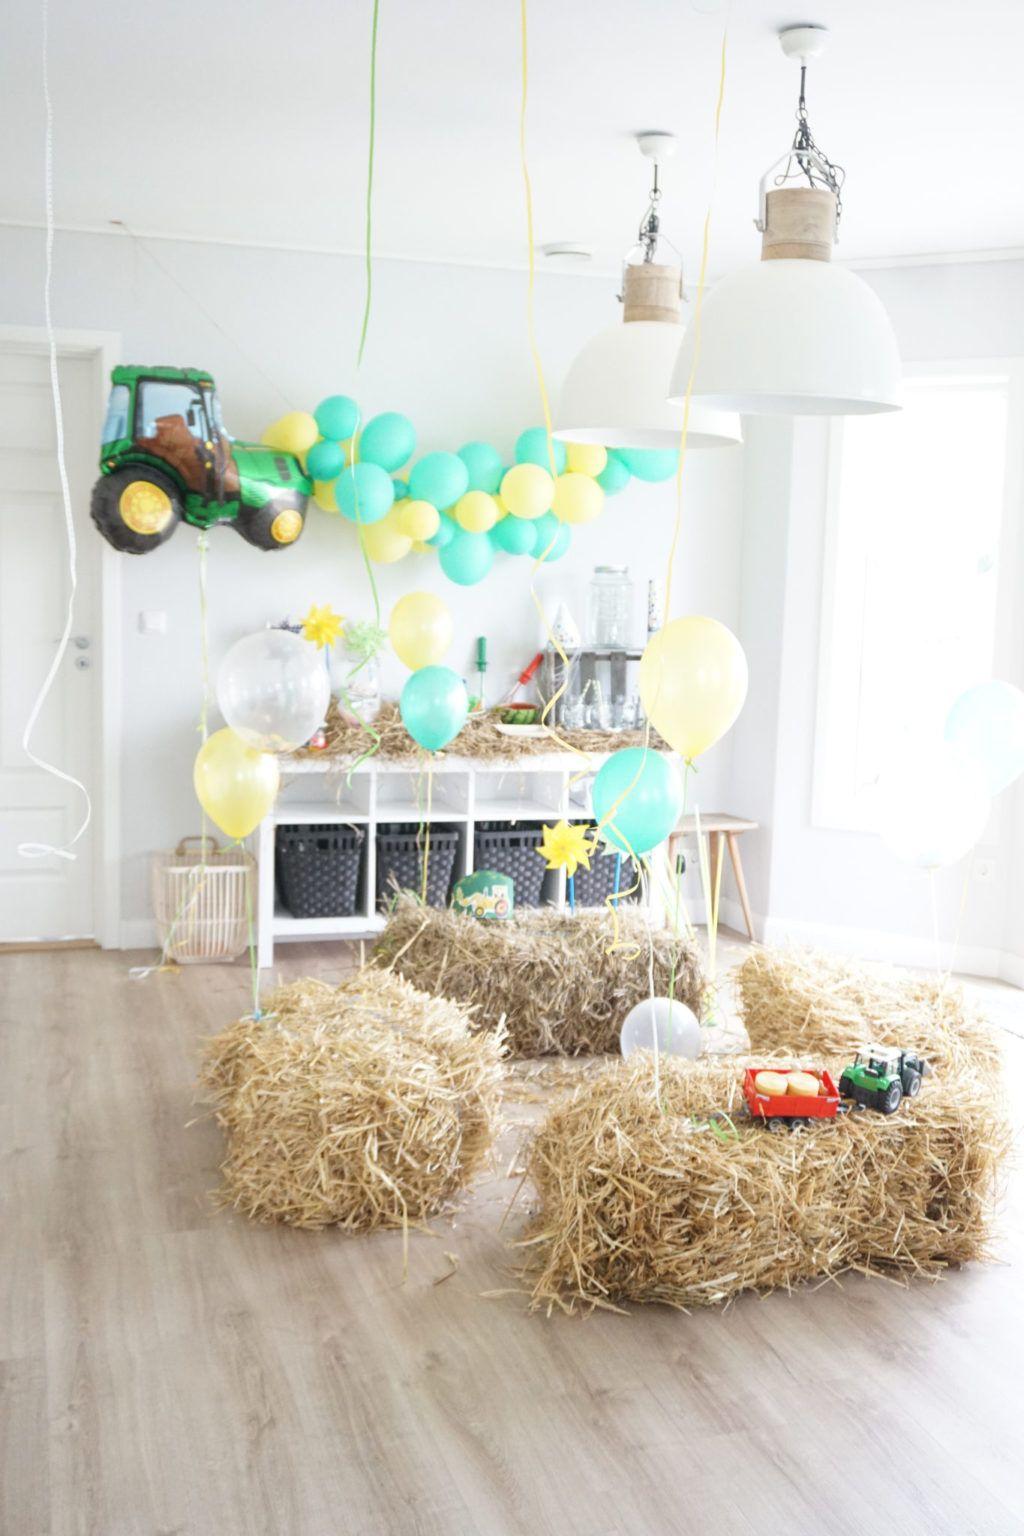 Traktor Geburtstag Einladung Torte Deko - Deko-Hus